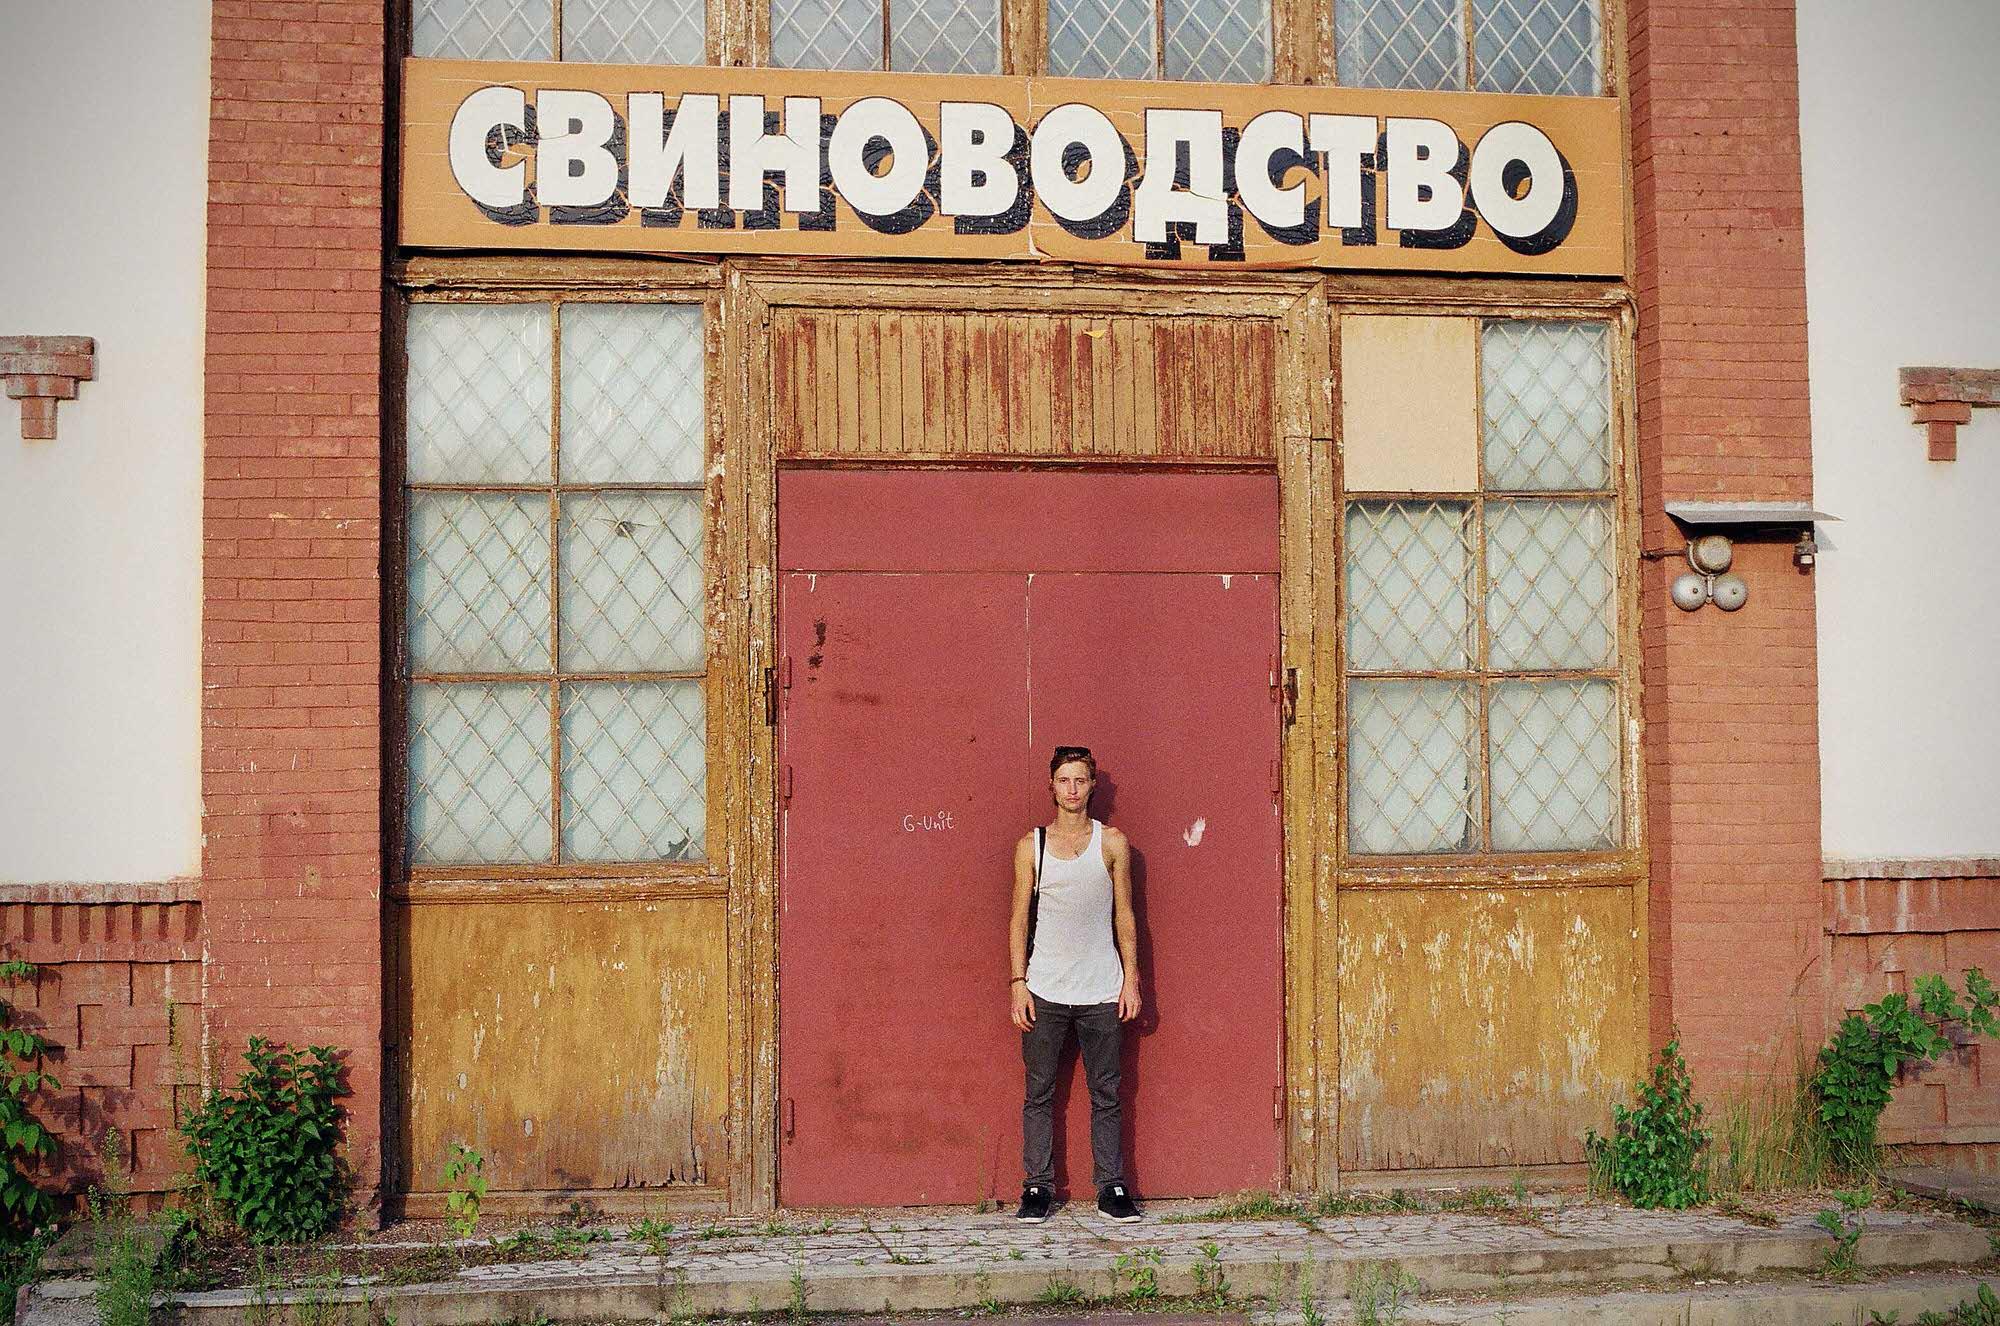 35mmPatrikWallner_Moscow_ZvereffCbnhobodctboLOWQ